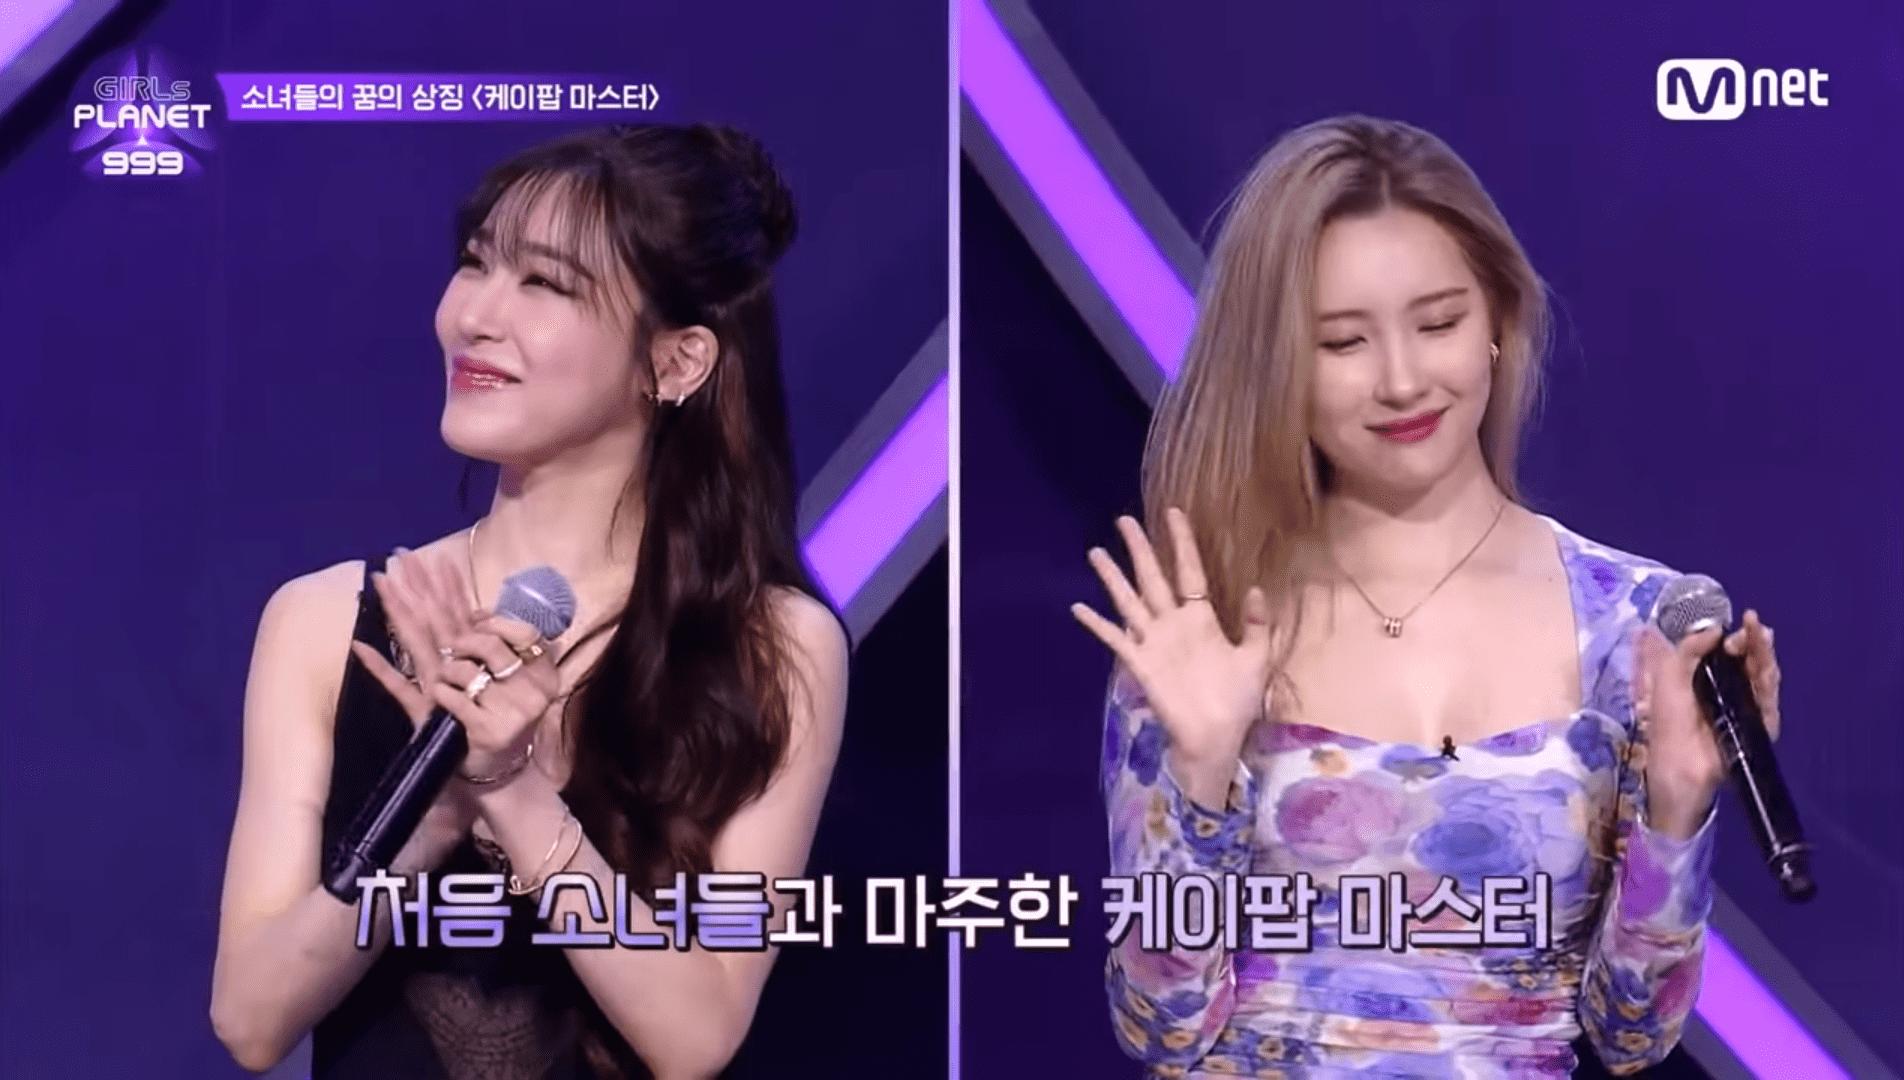 Mnet 'Girls Planet 999' Episode 1 Recap: TOP9 spots and CLC's Yujin vs Fu  Yaning drama   MEAWW